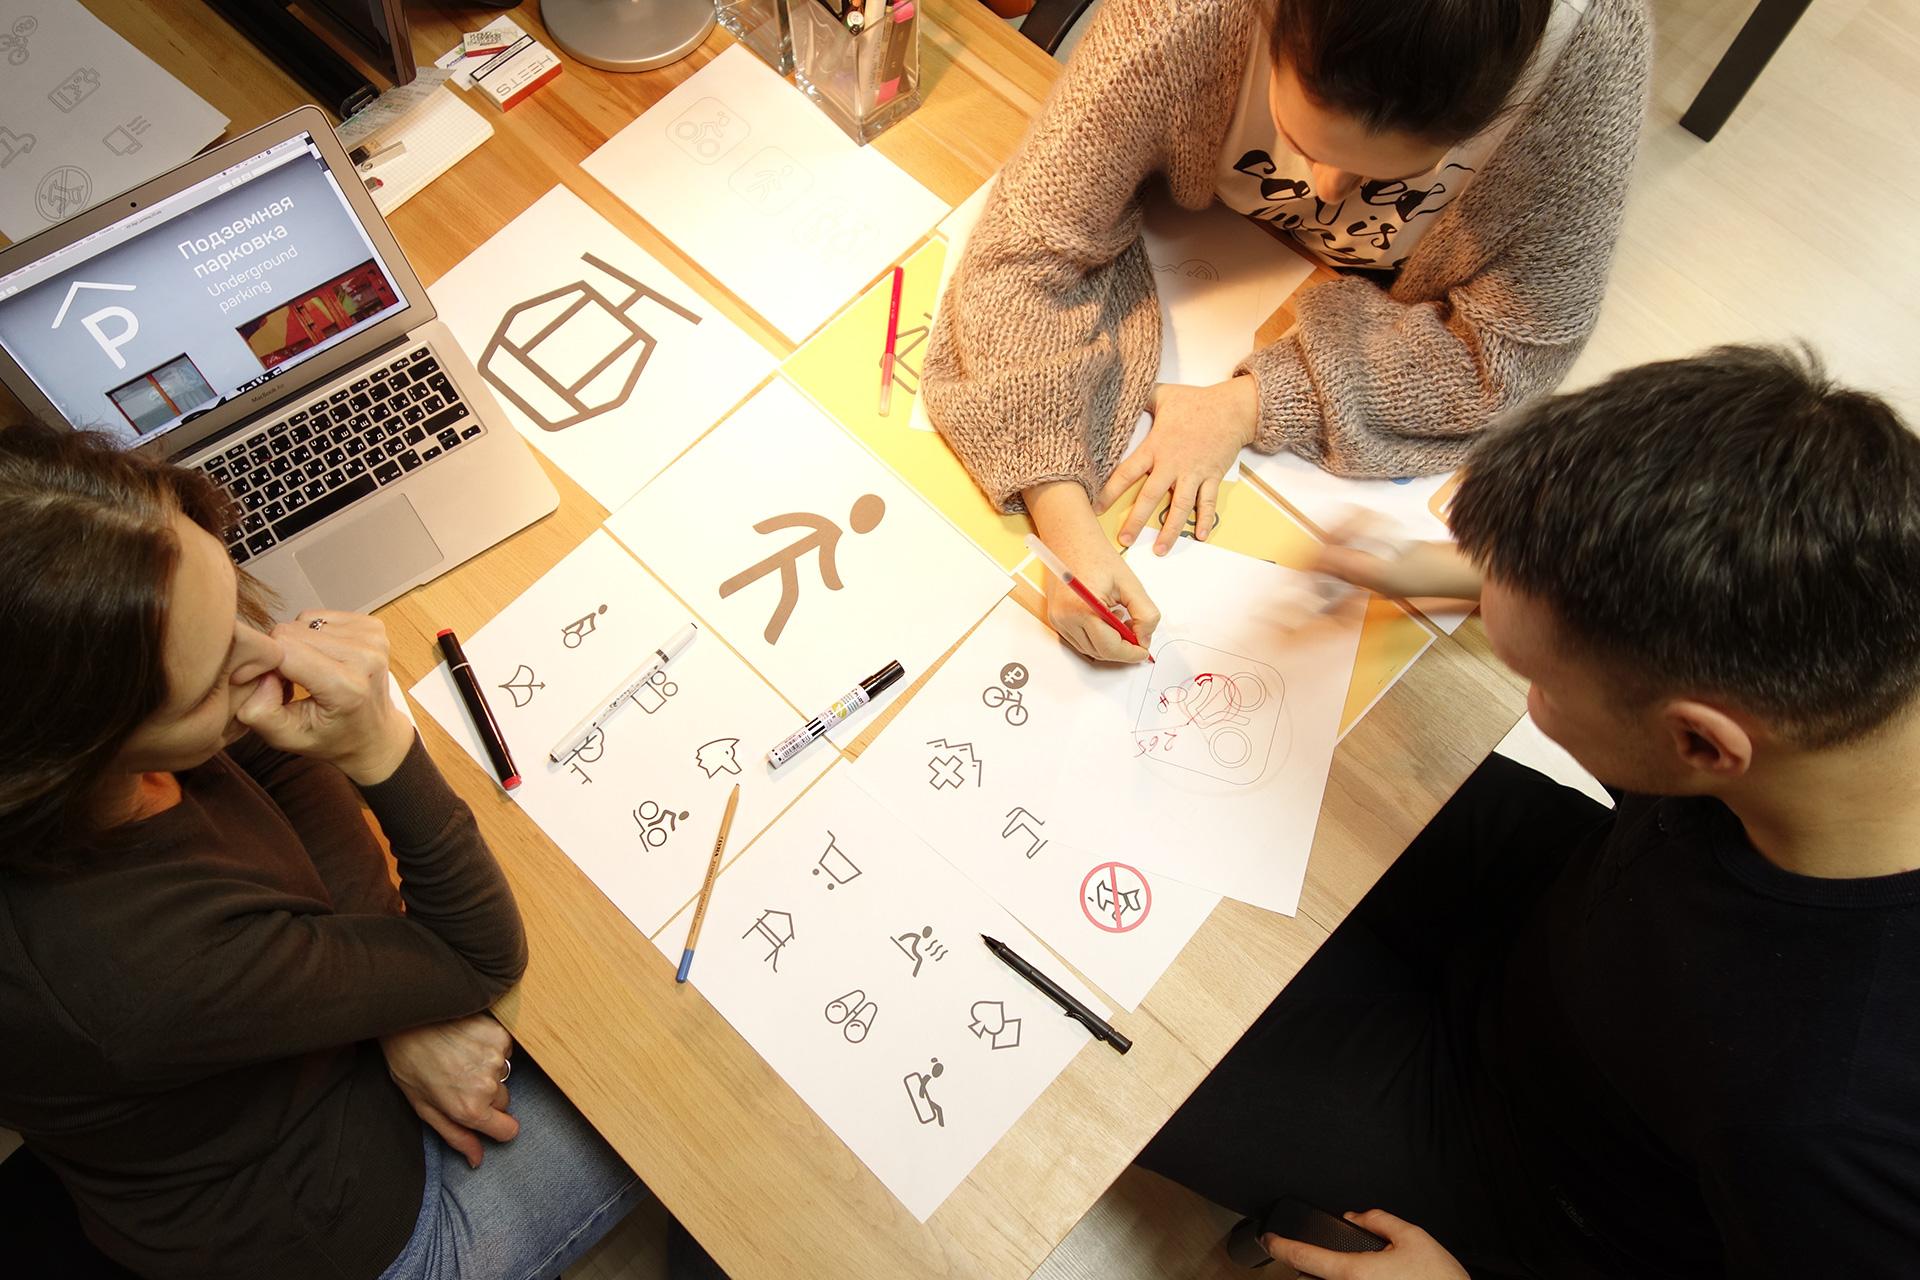 Асгард Брендинг, Курорт Красная Поляна, ребрендинг, графический дизайн, средовой дизайн, система графической навигации, Asgard Branding, signagesystem, Krasnaya Polyana resort, re-branding